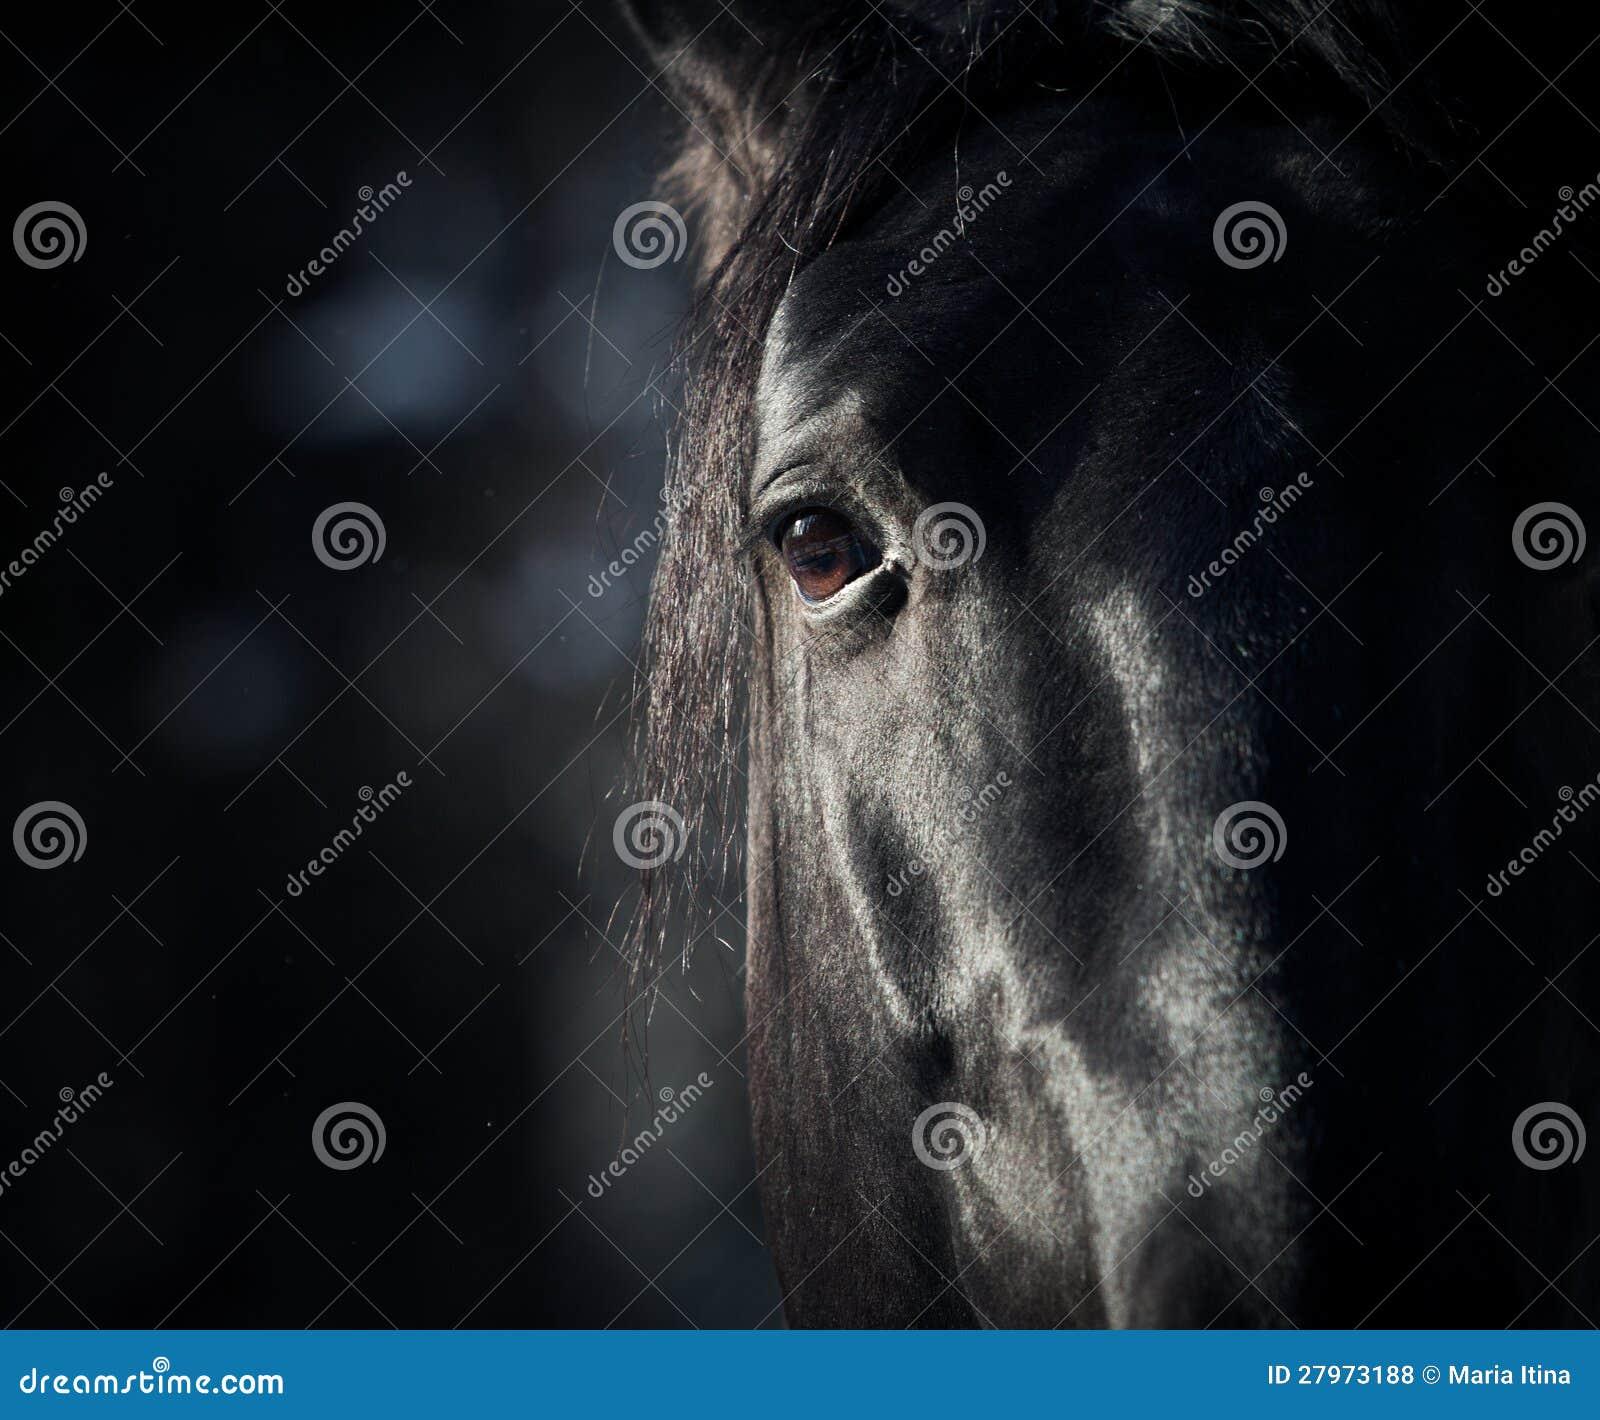 Глаз лошади в темноте